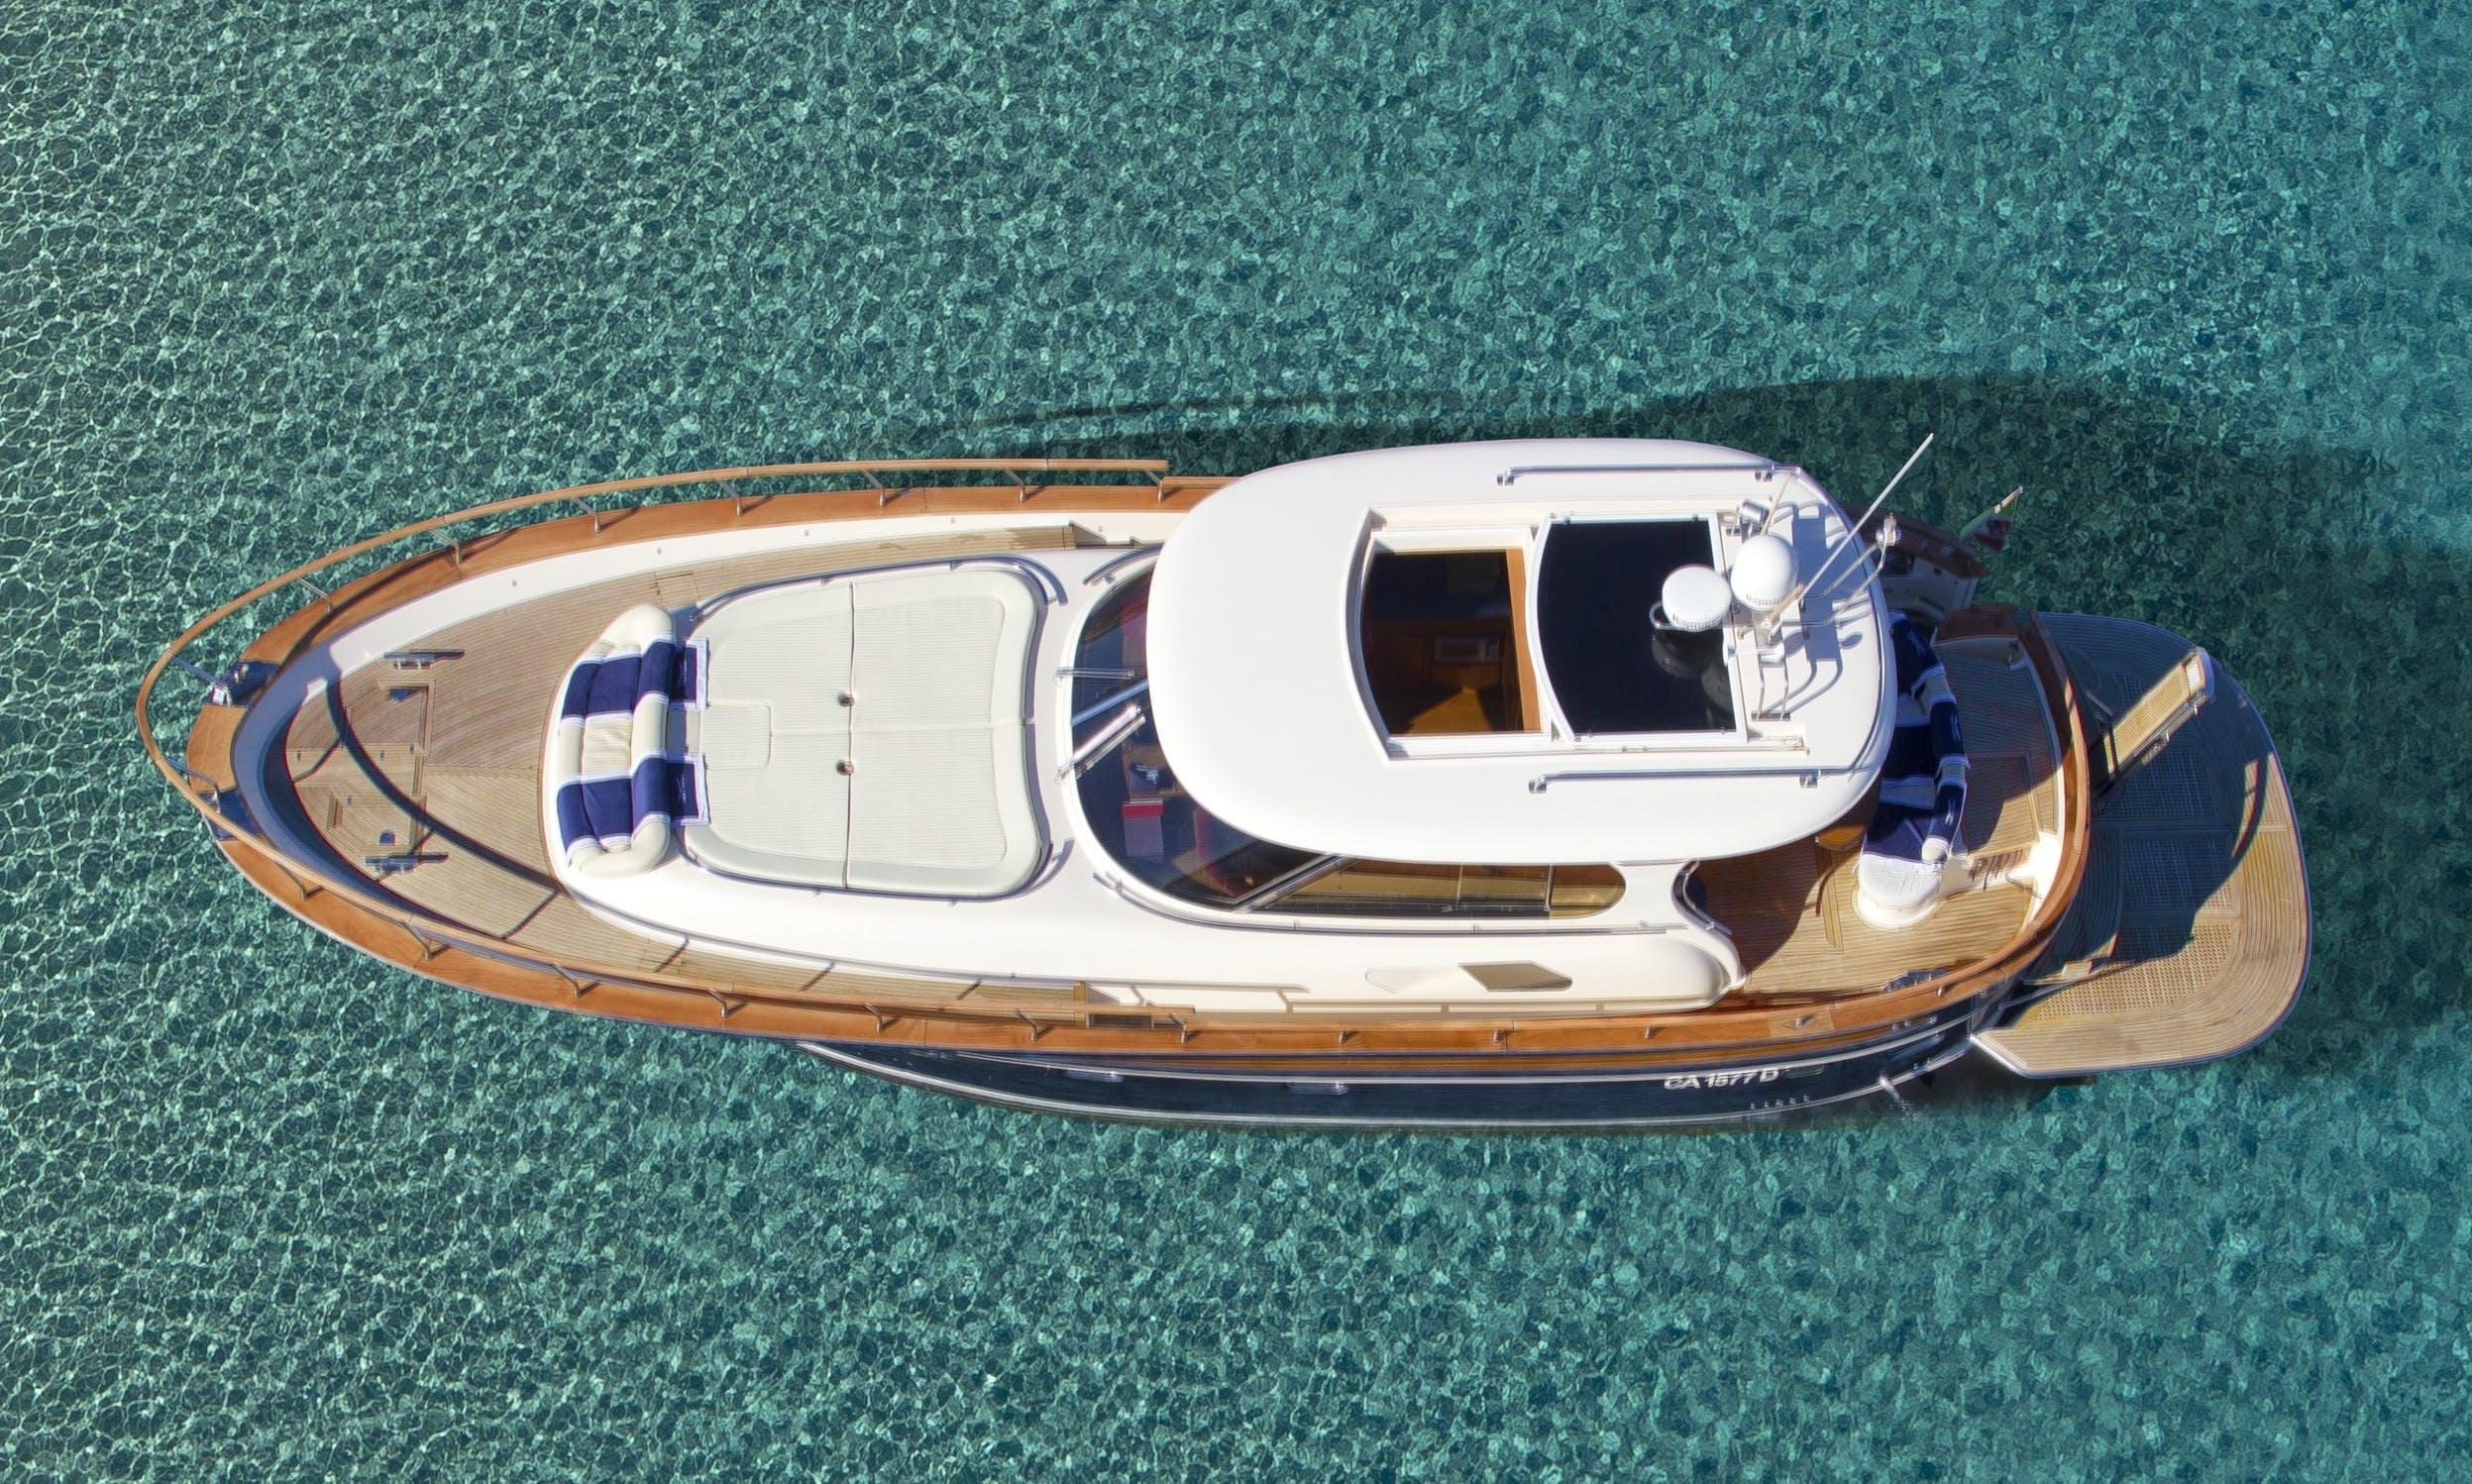 Charming, Classic Motor Yacht Rental in Villasimius, Sardinia